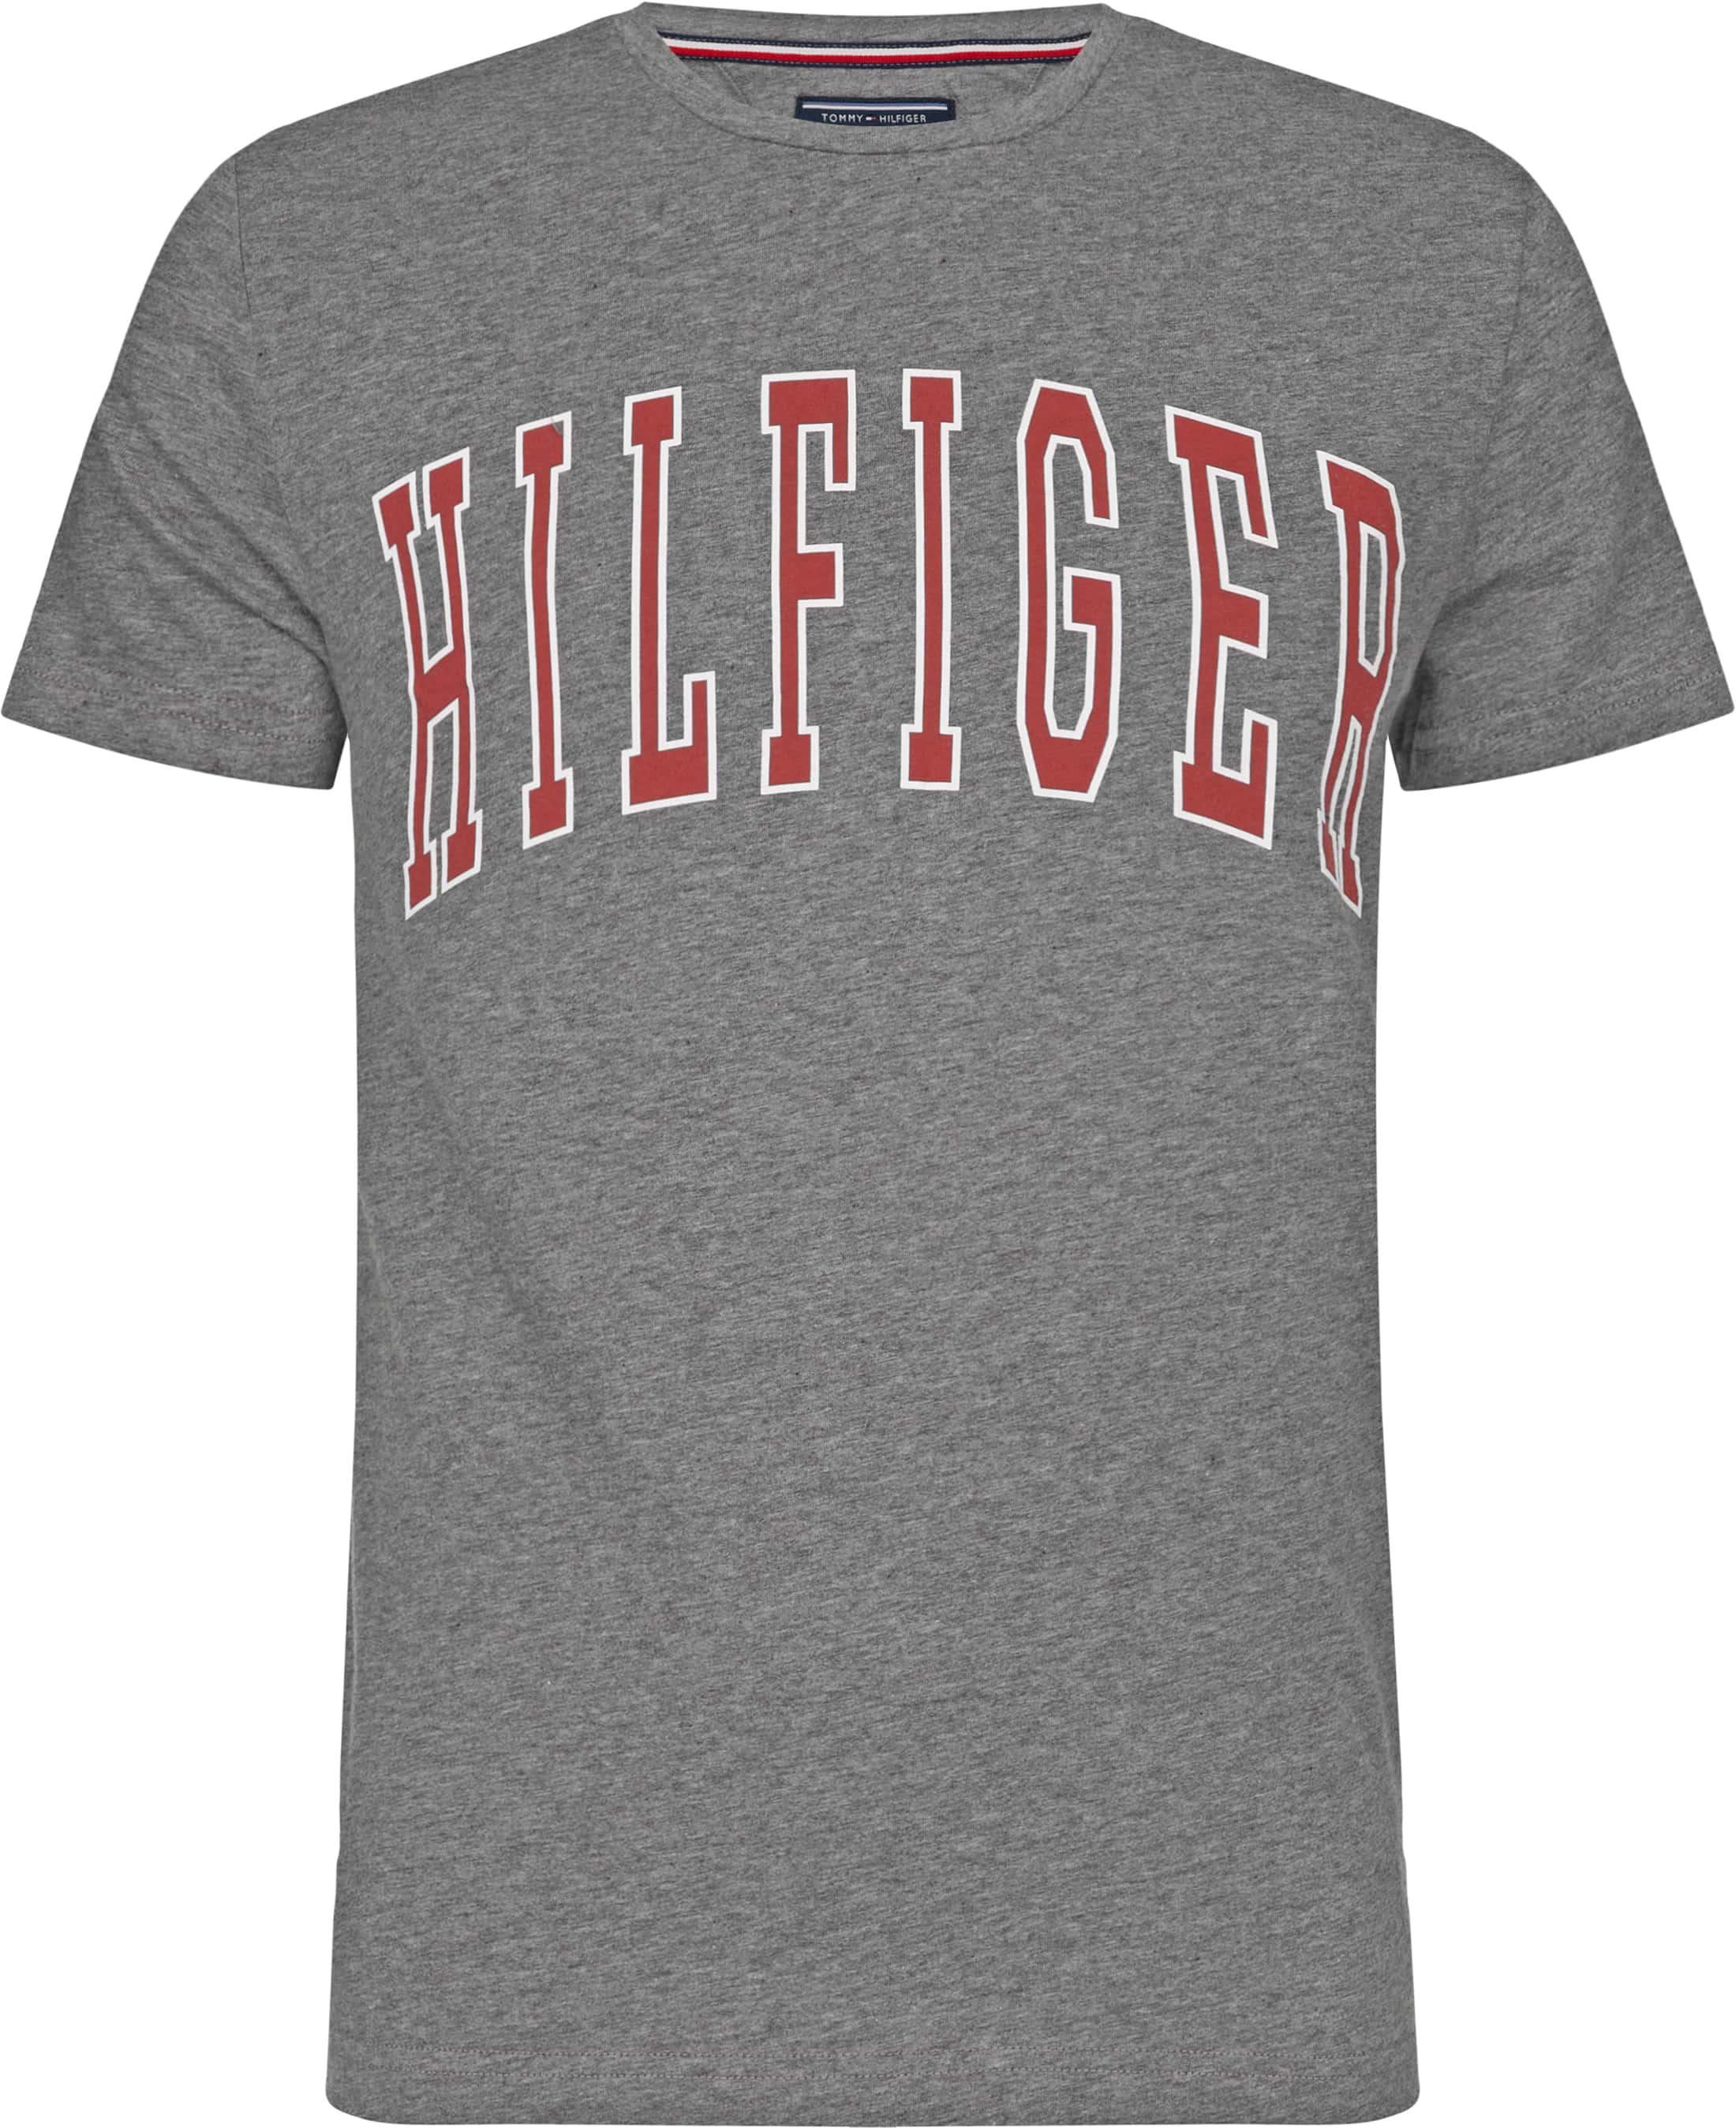 Tommy Hilfiger T-shirt College Grijs foto 0